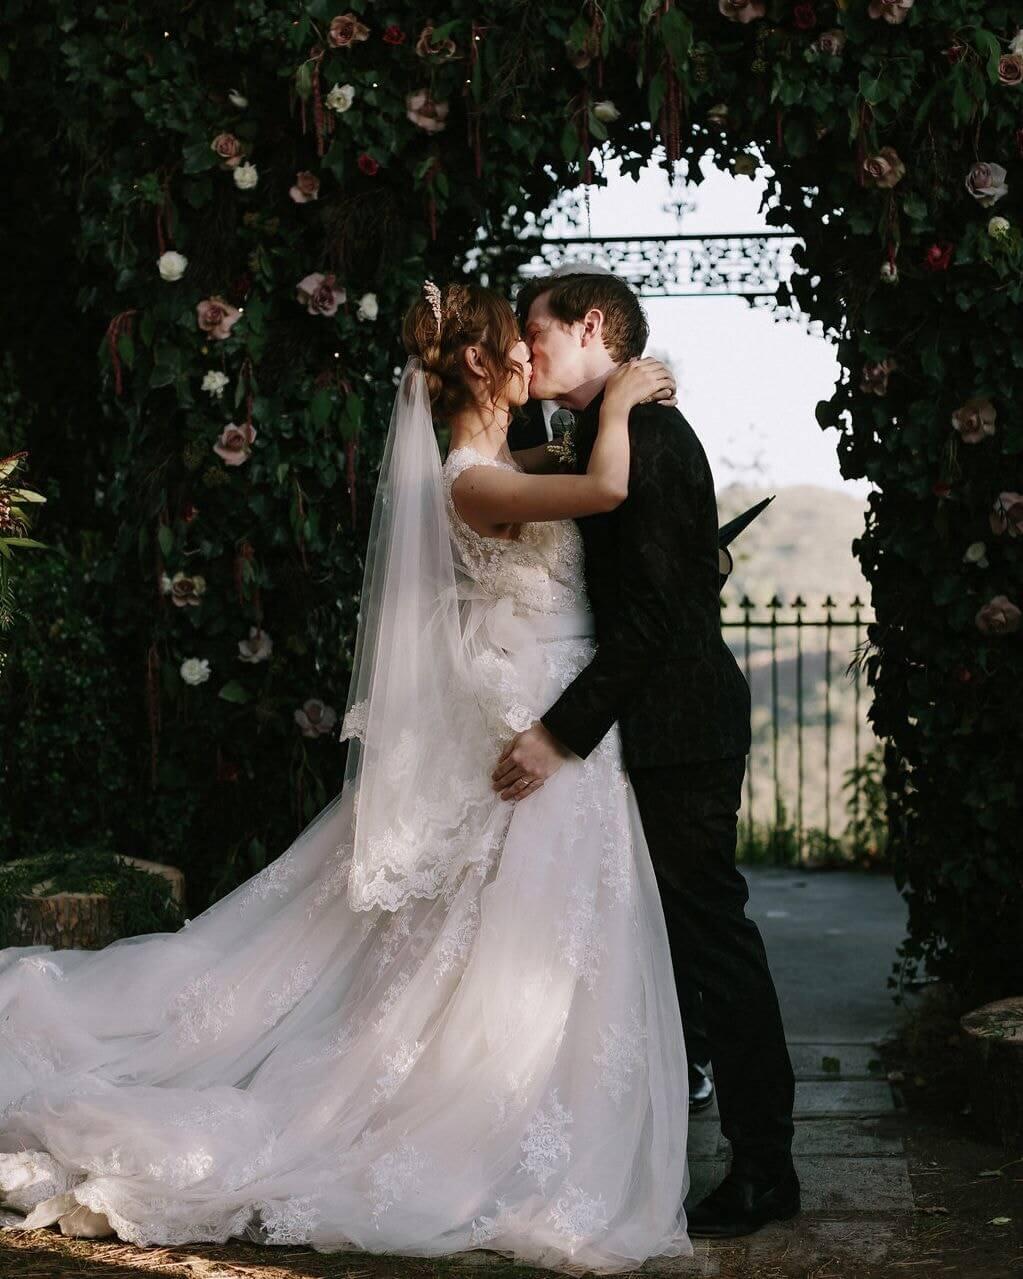 Harry Potter-Themed Wedding 9 (1)